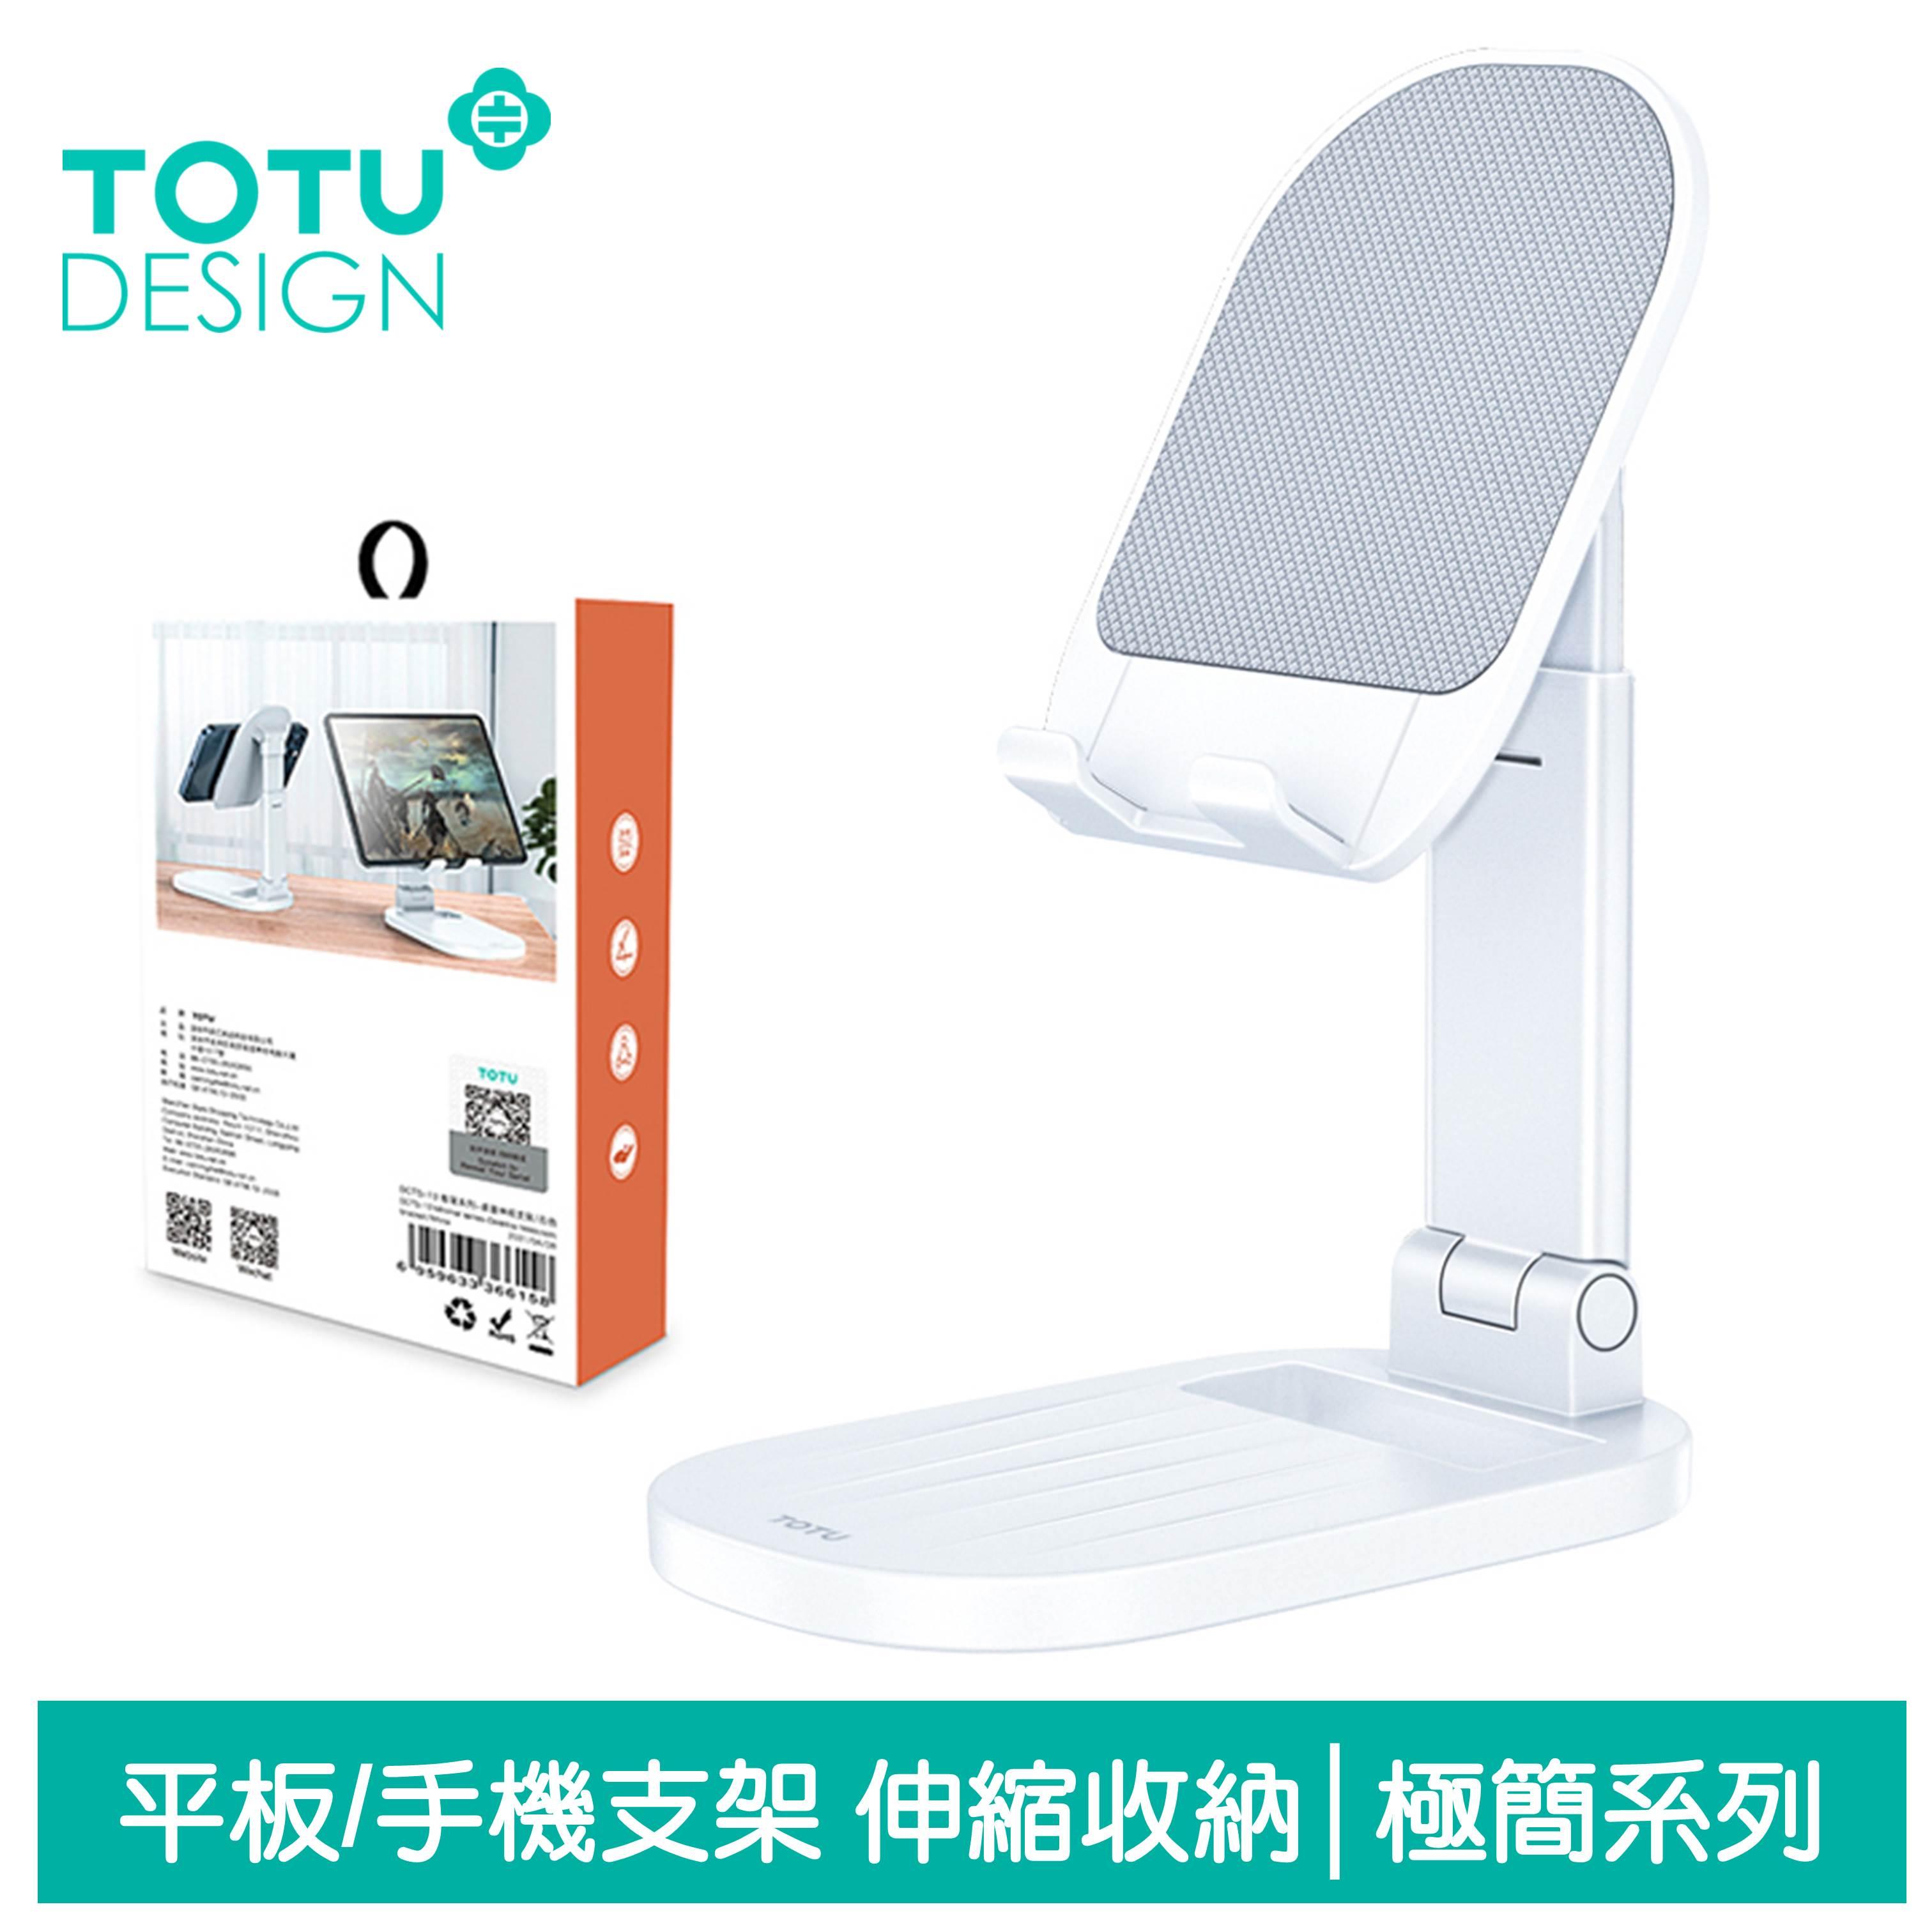 TOTU台灣官方 平板/手機支架伸縮收納桌上型直播懶人支架手機架 極簡系列 白色